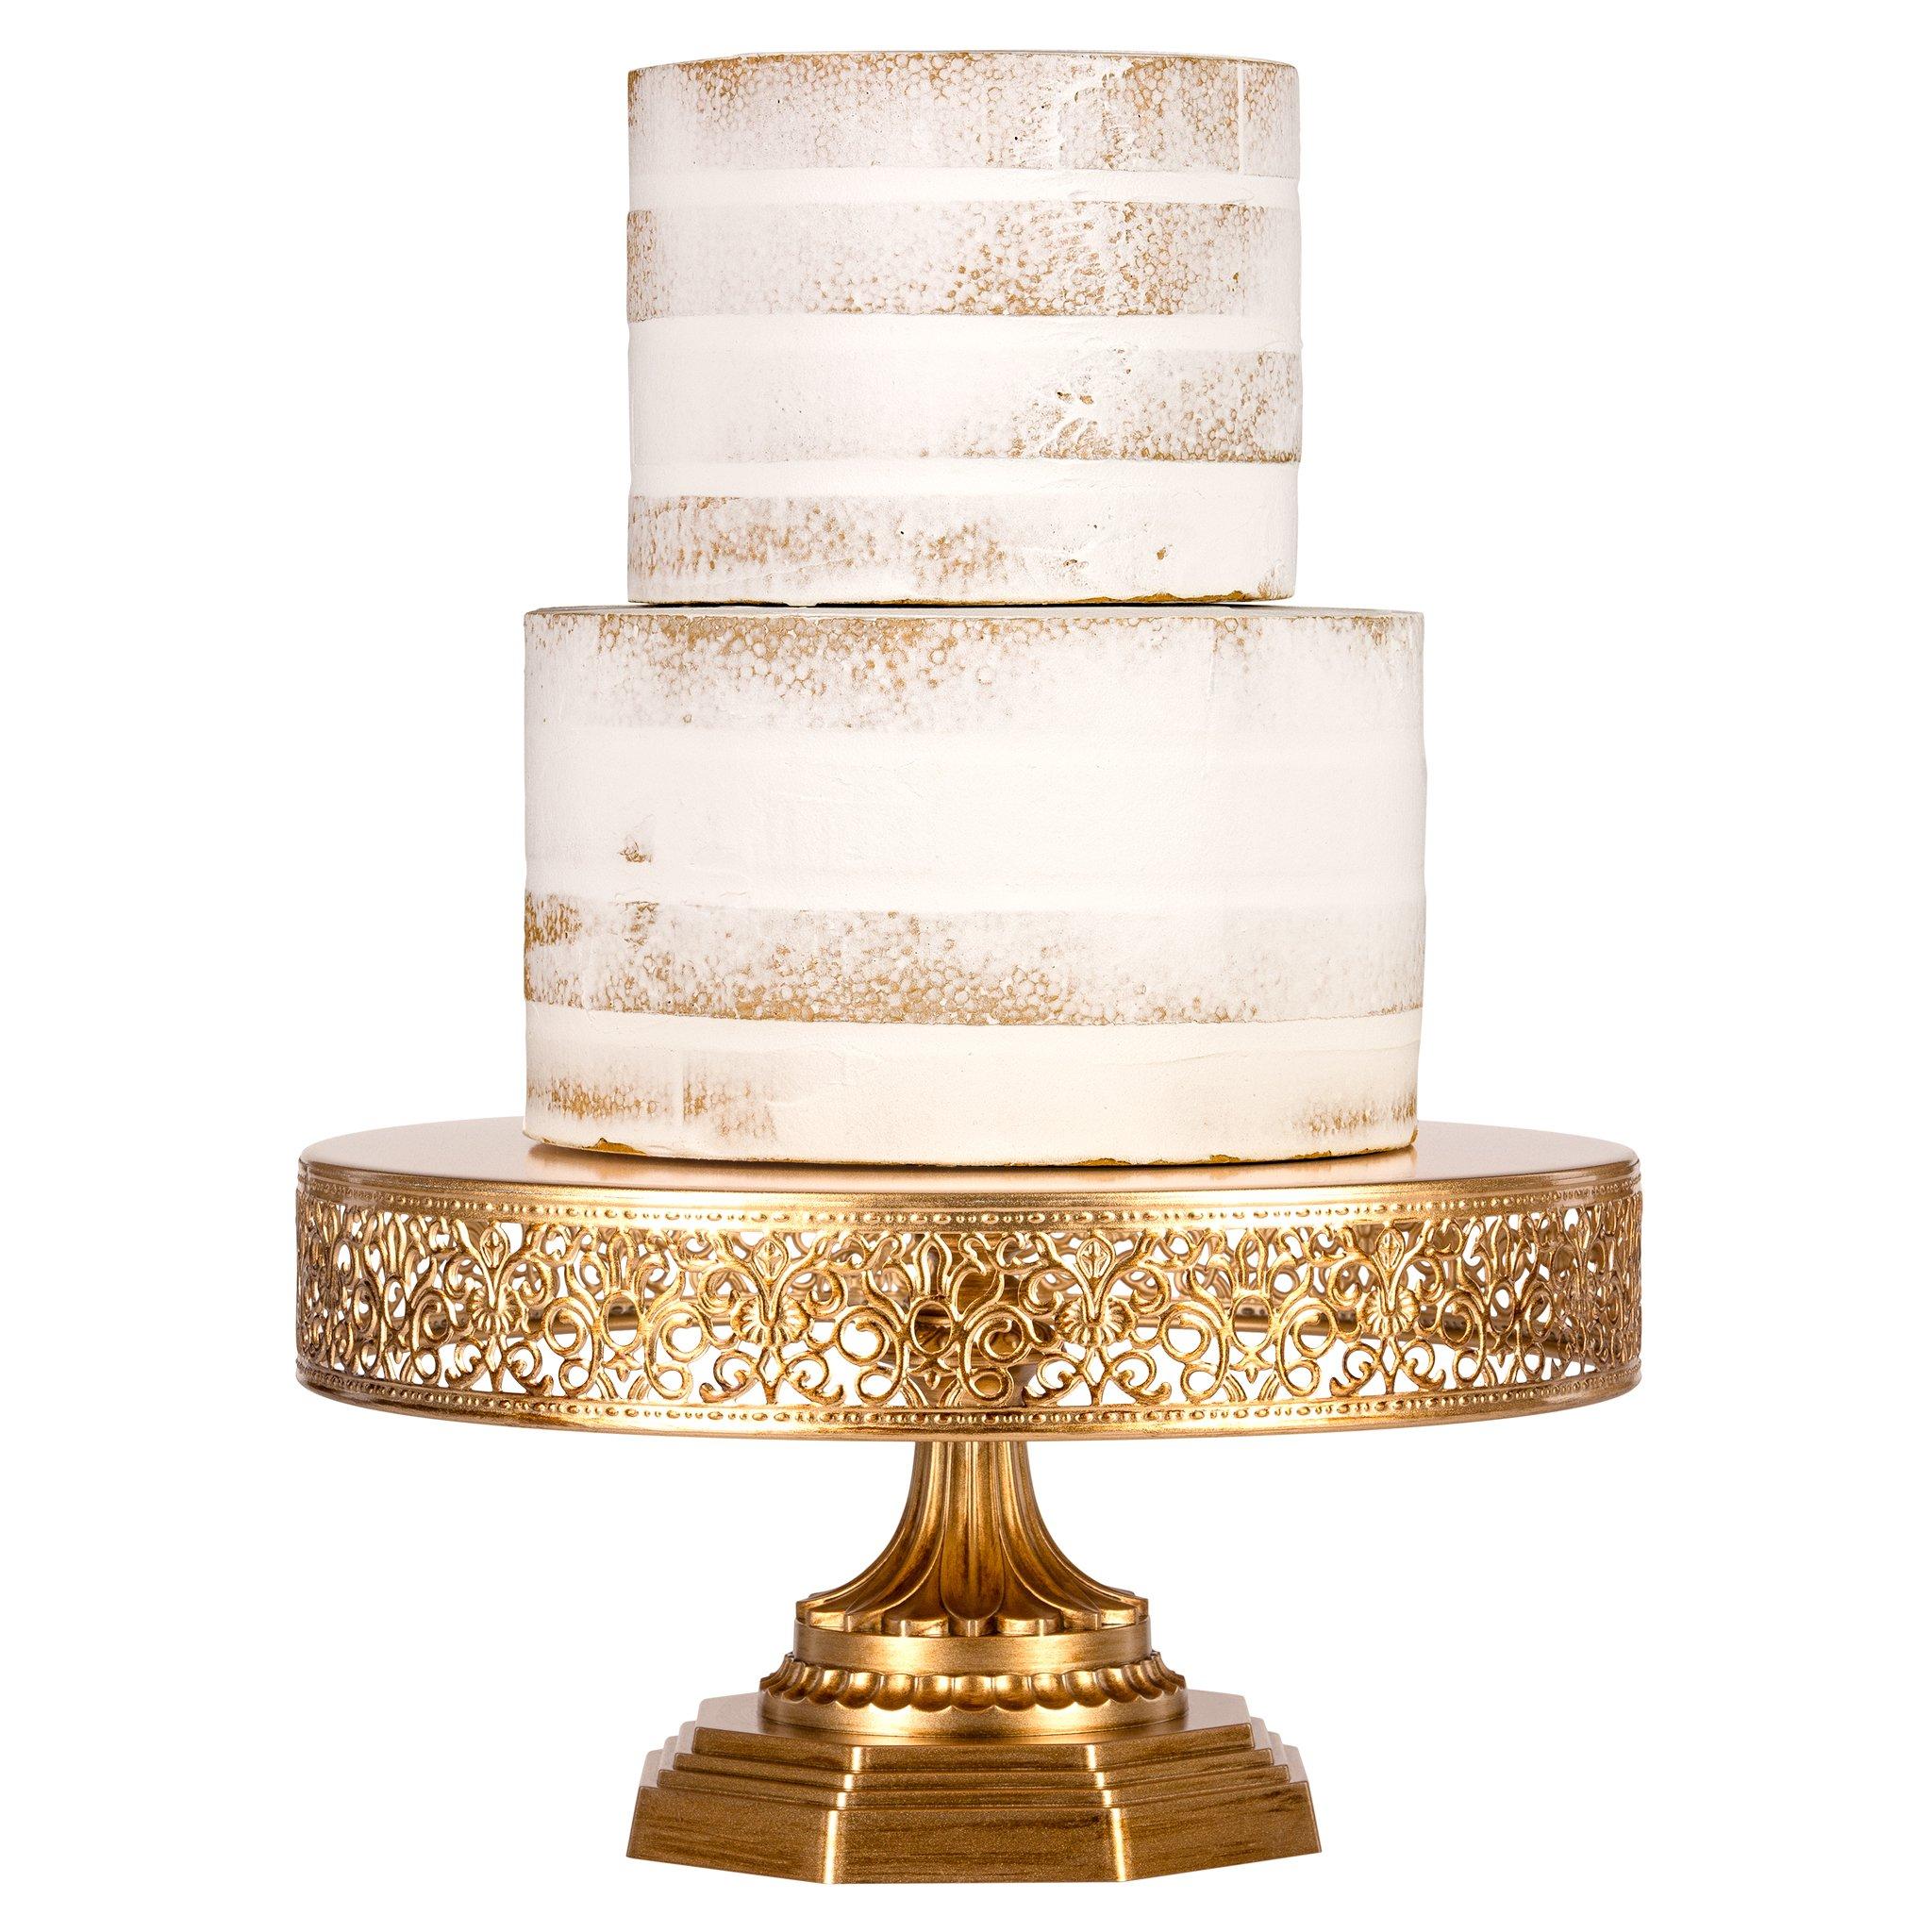 Amalfi Decor 12 Inch Vintage Round Metal Wedding Cake Stand (Gold ...